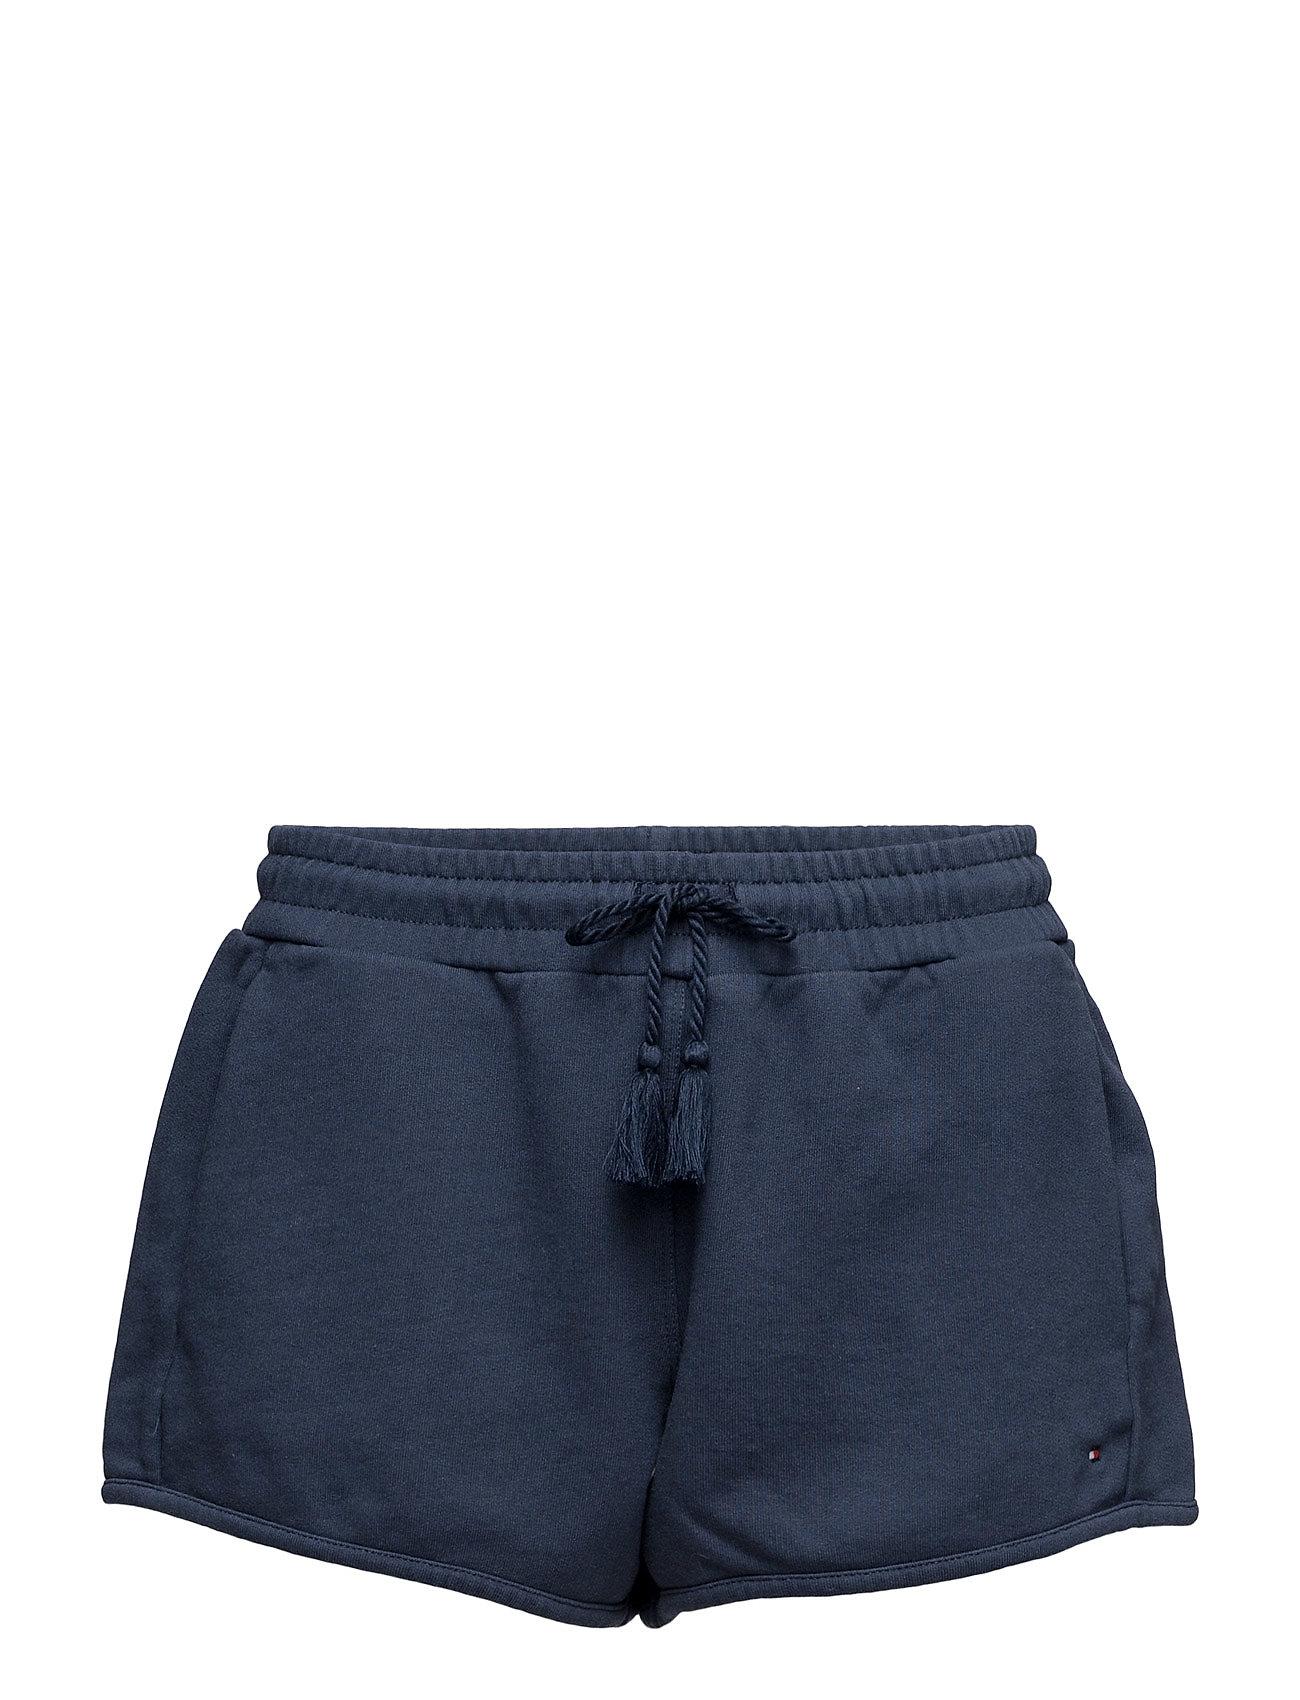 Kiara Sweat Shorts Tommy Hilfiger Loungewear til Damer i Blå